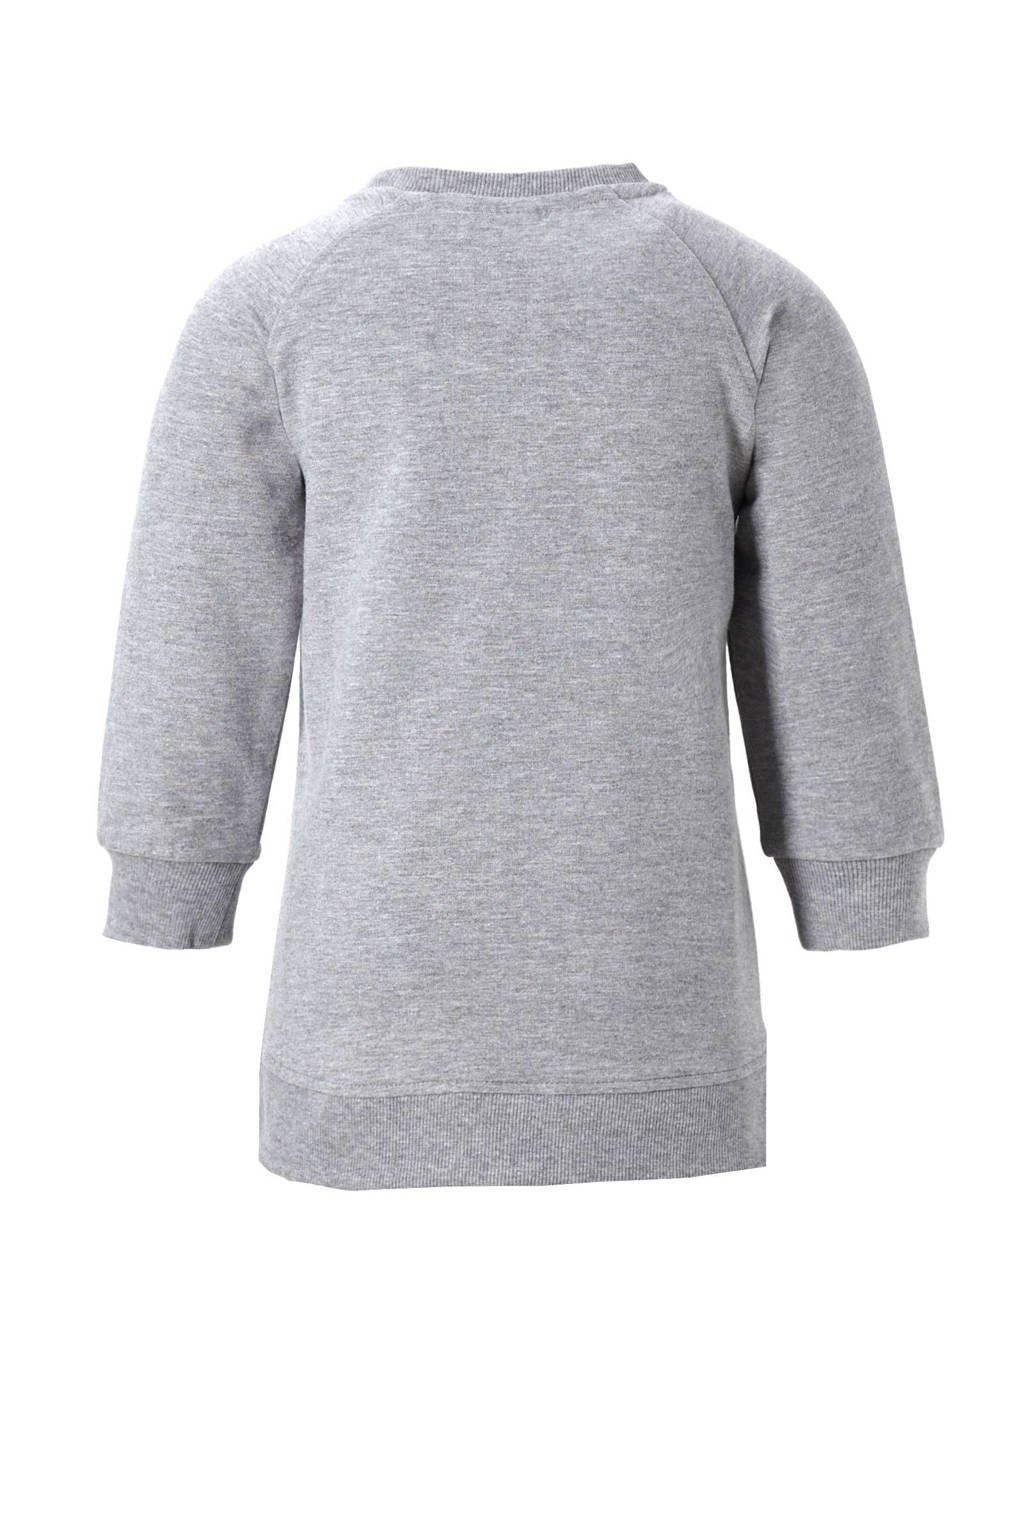 5e2c1796289904 name it sweater, Grijs melange